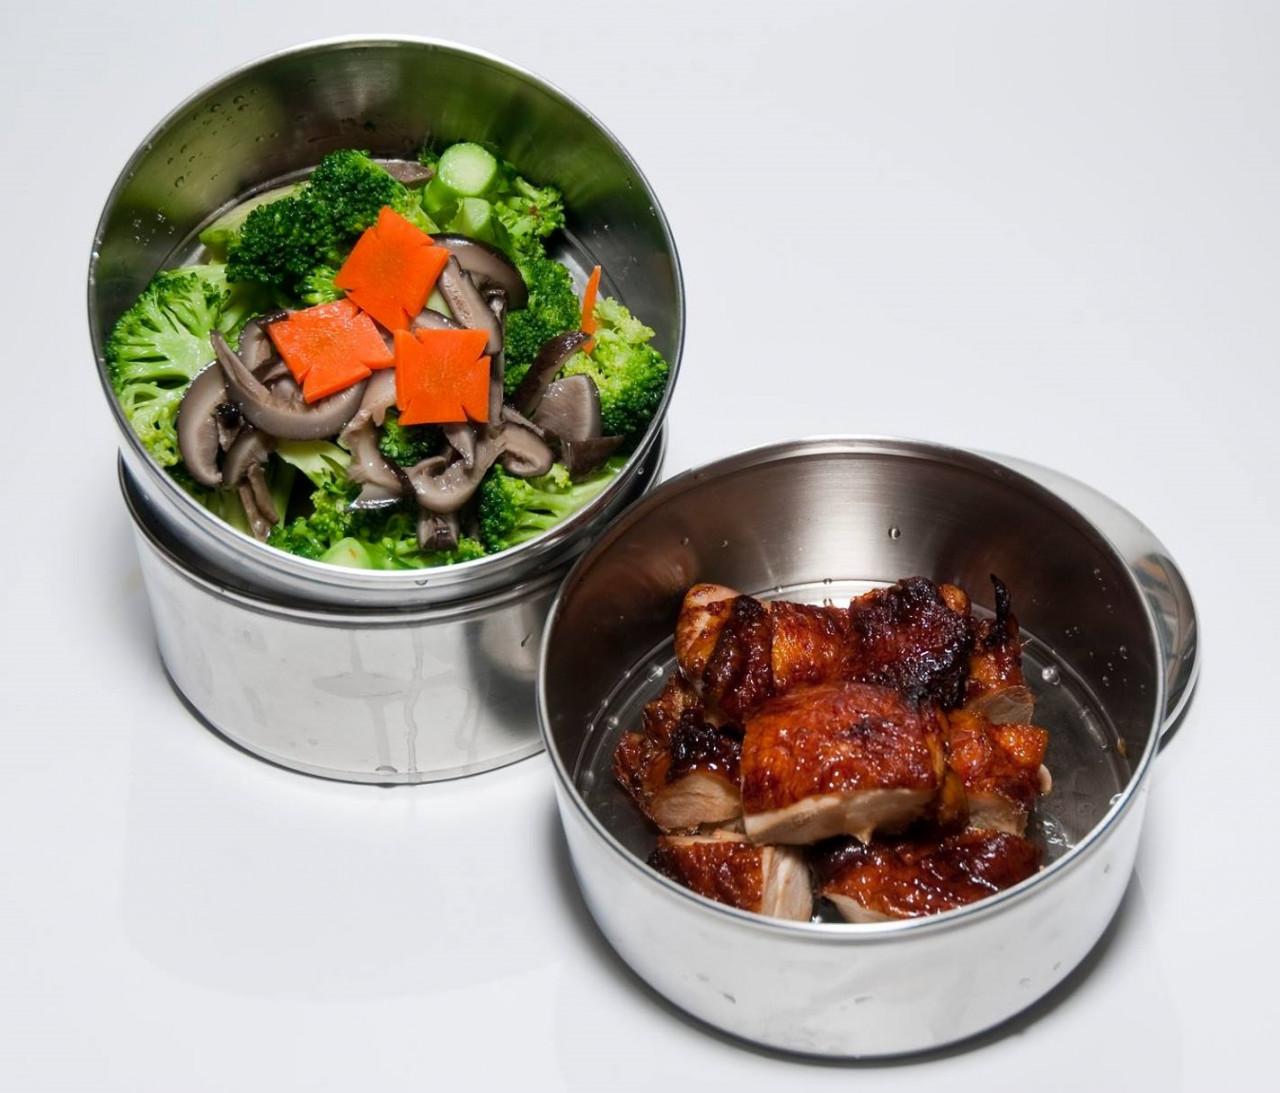 KCK Catering - 盒饭外卖服务